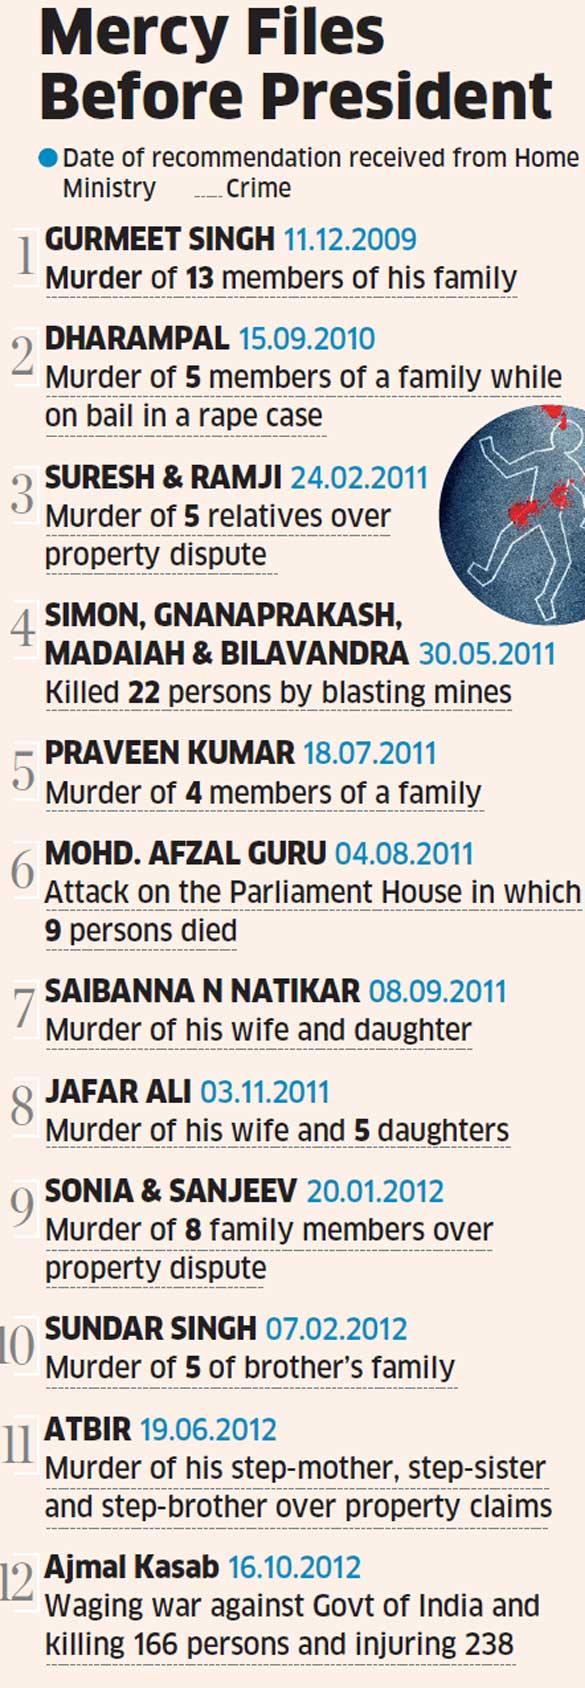 Ajmal Kasab's mercy petition last among 12 pending petitions in President Pranab Mukherjee's office